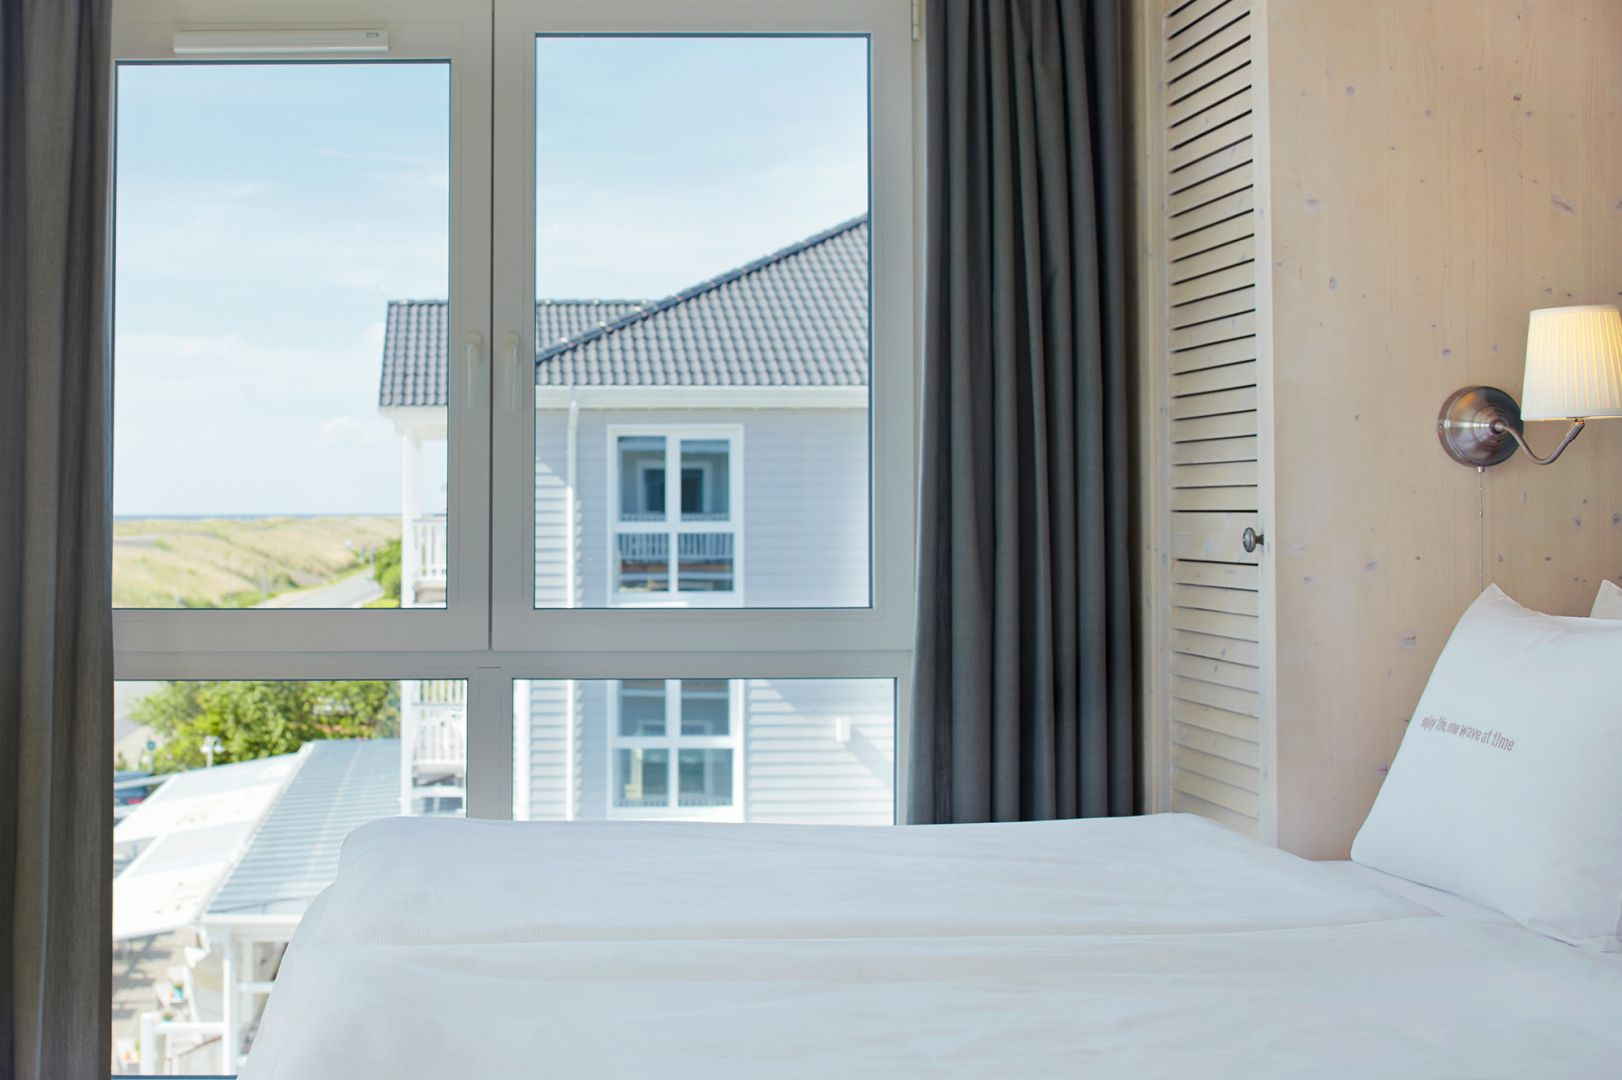 ocean beach motel st peter ording. Black Bedroom Furniture Sets. Home Design Ideas